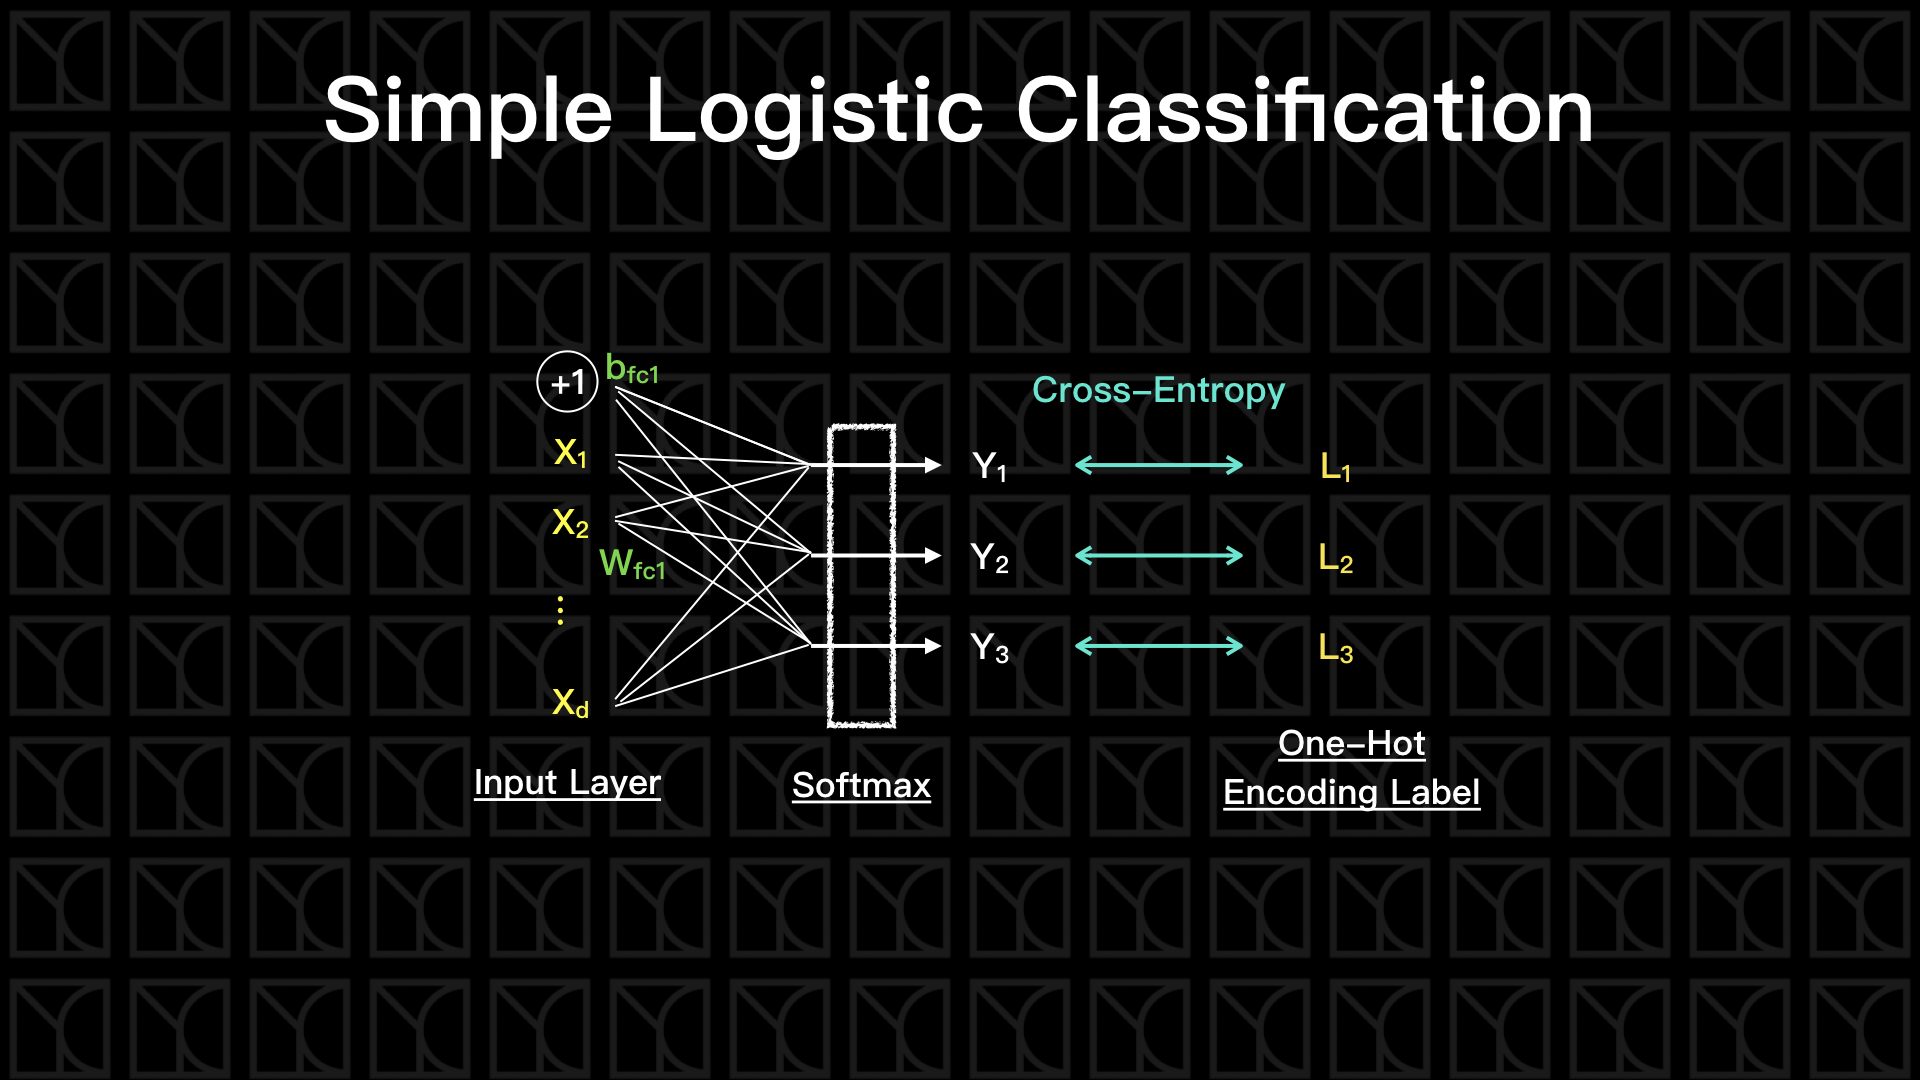 Simple Logistic Classification